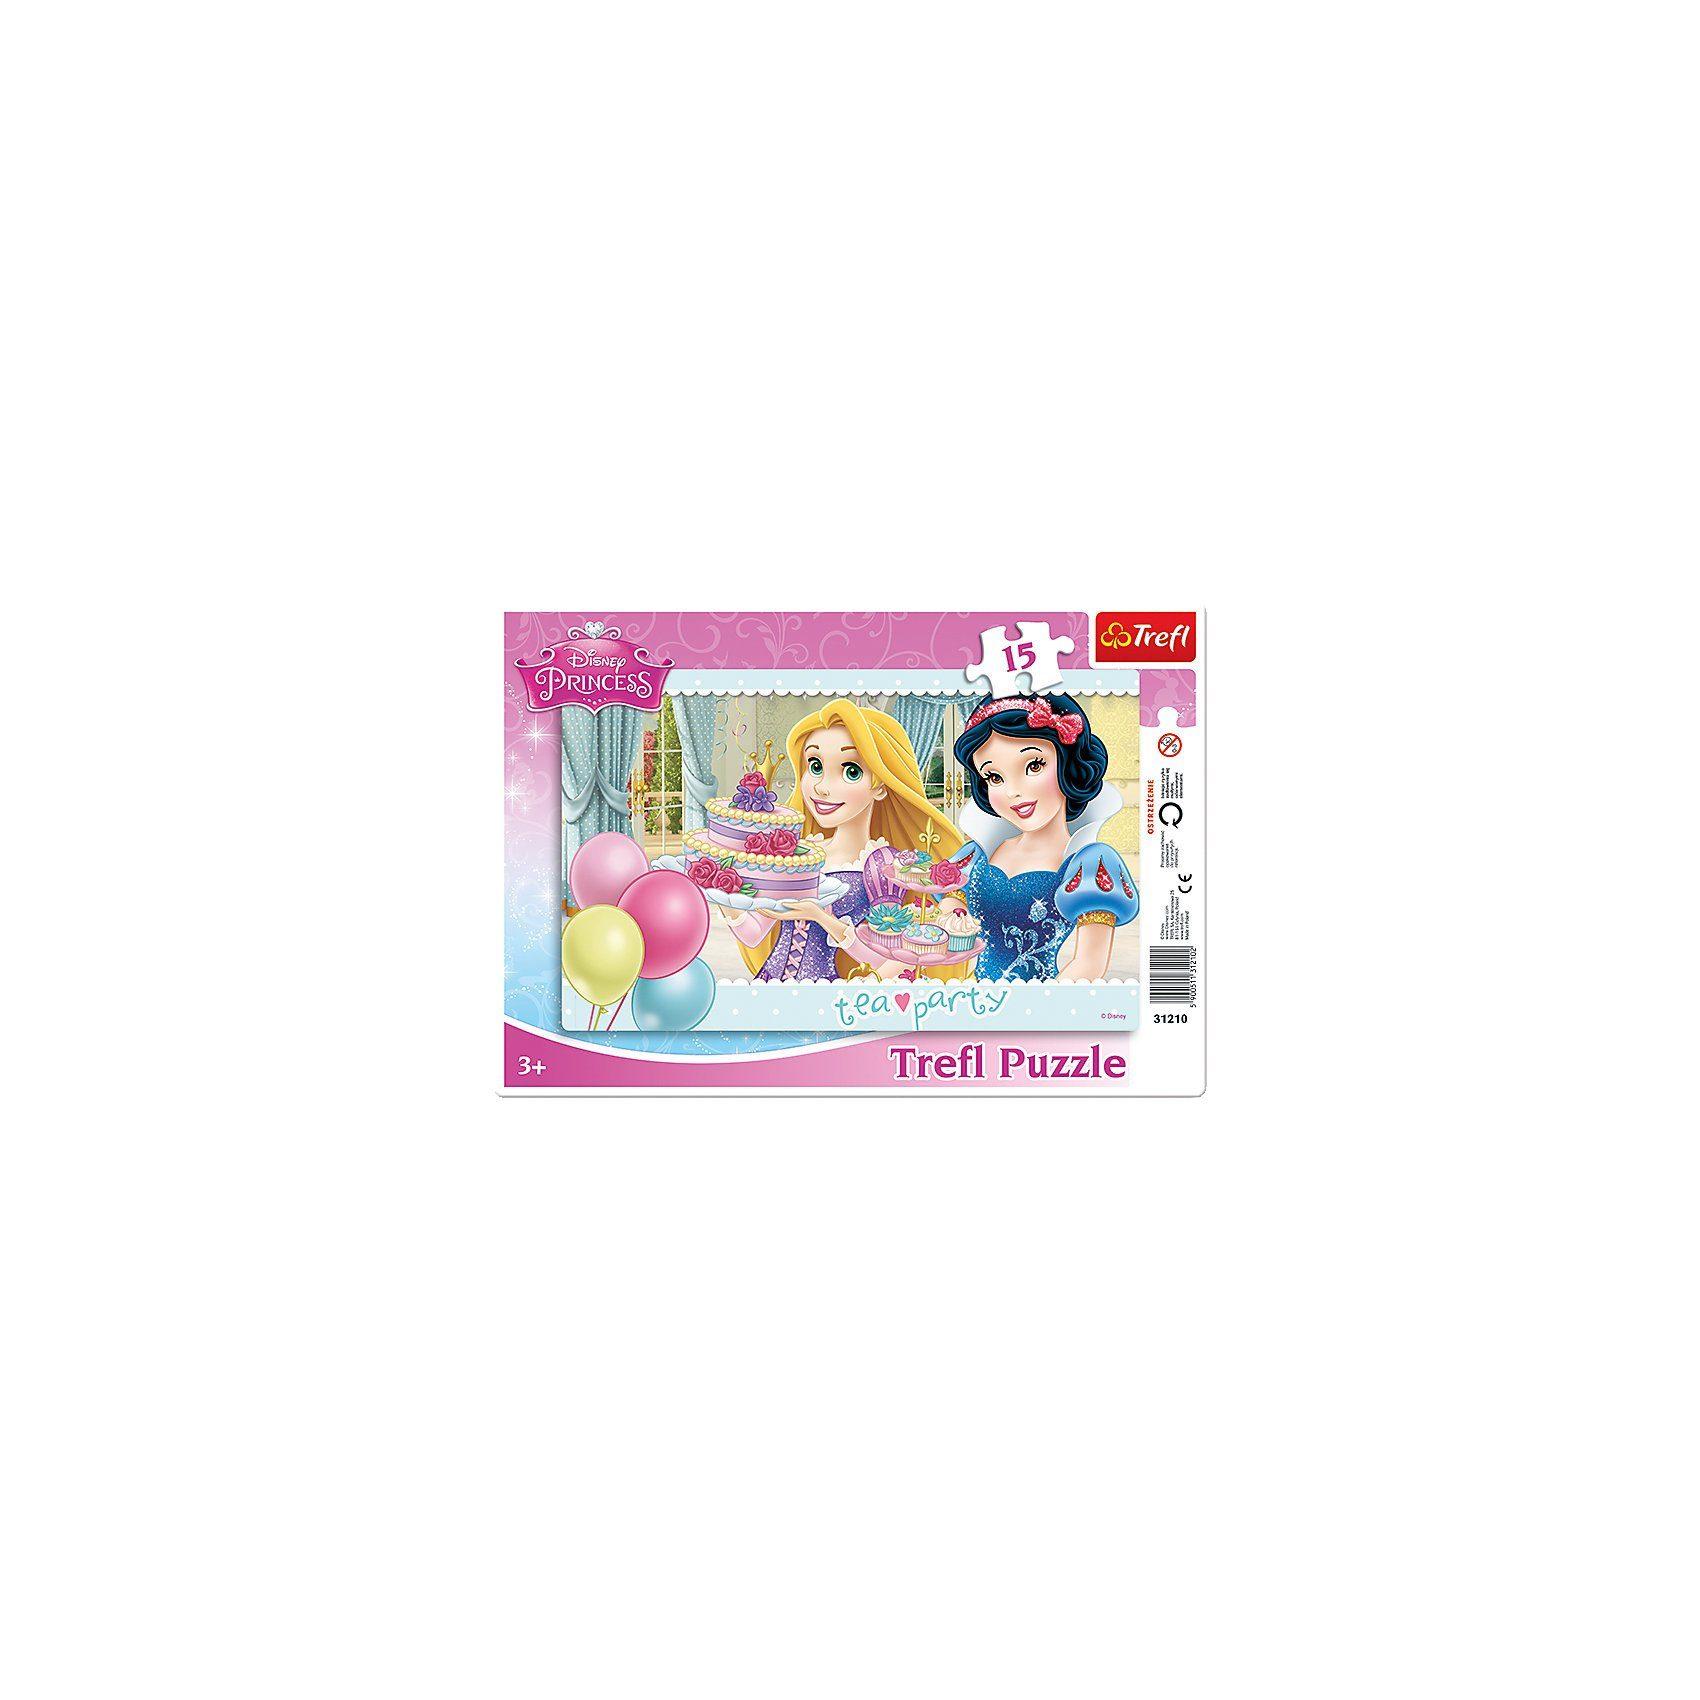 Trefl Rahmenpuzzle 15 Teile - Disney Princess